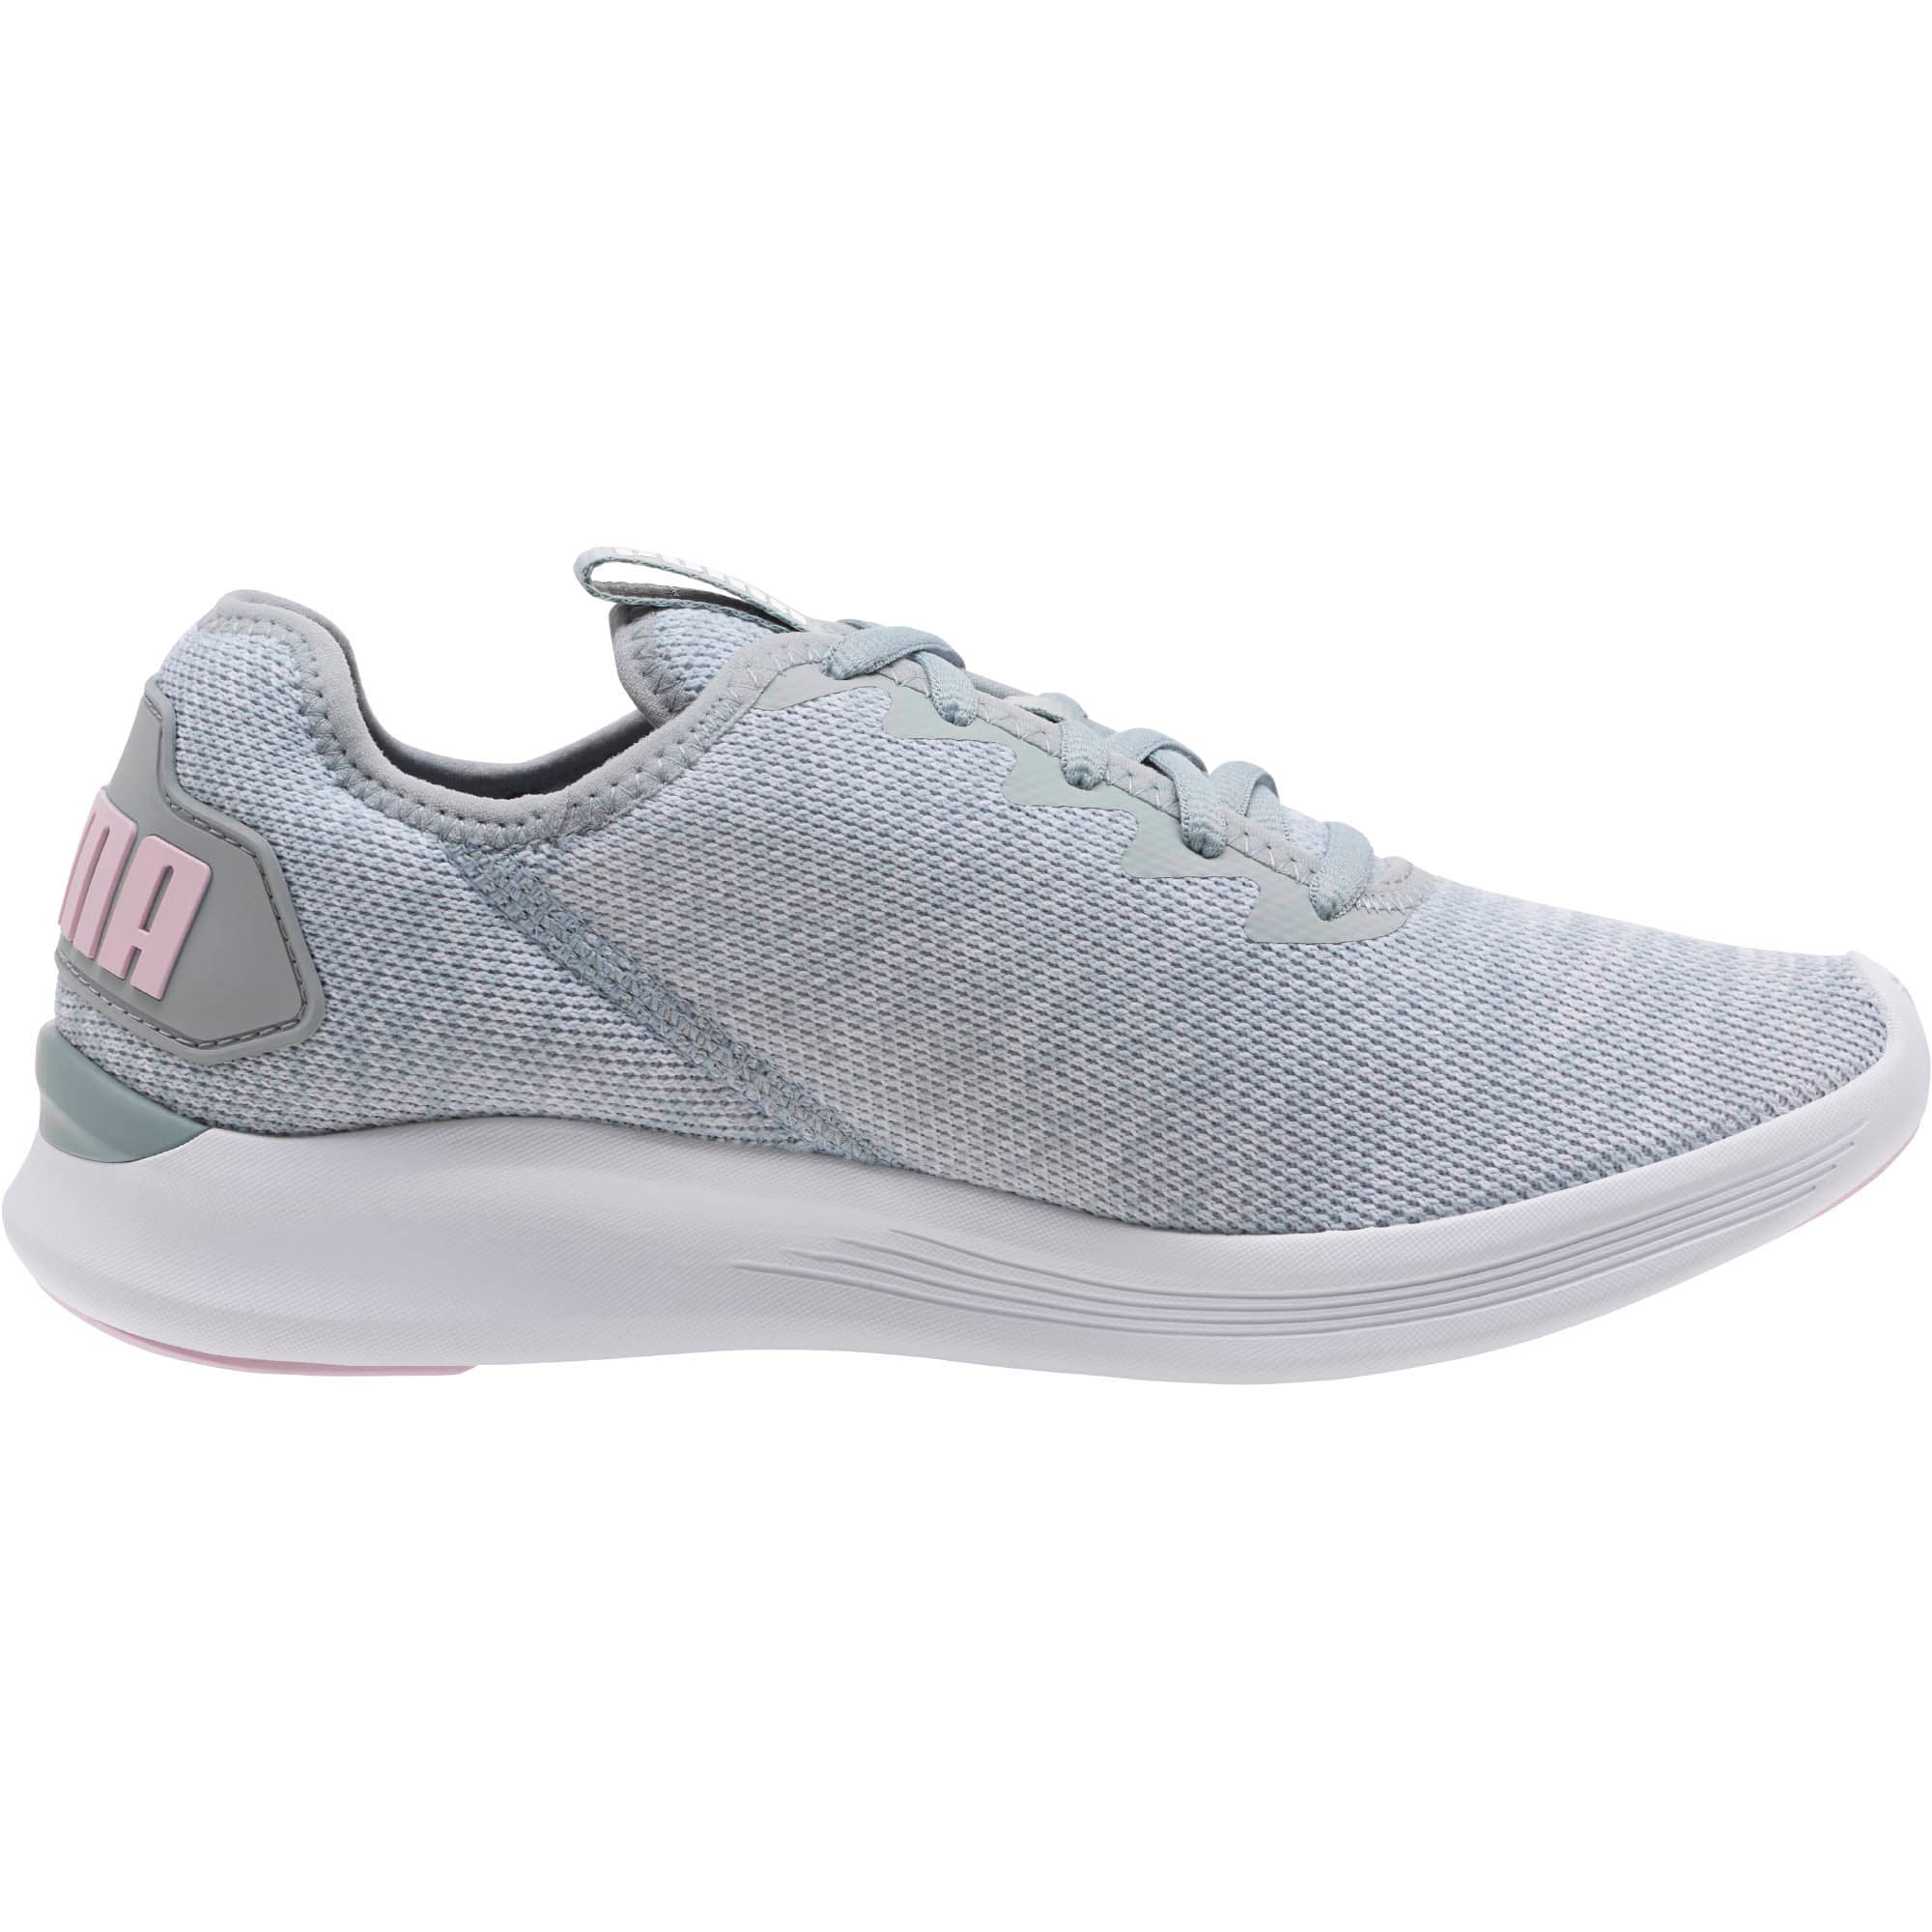 Thumbnail 4 of Ballast Women's Running Shoes, Quarry- Orchid- White, medium